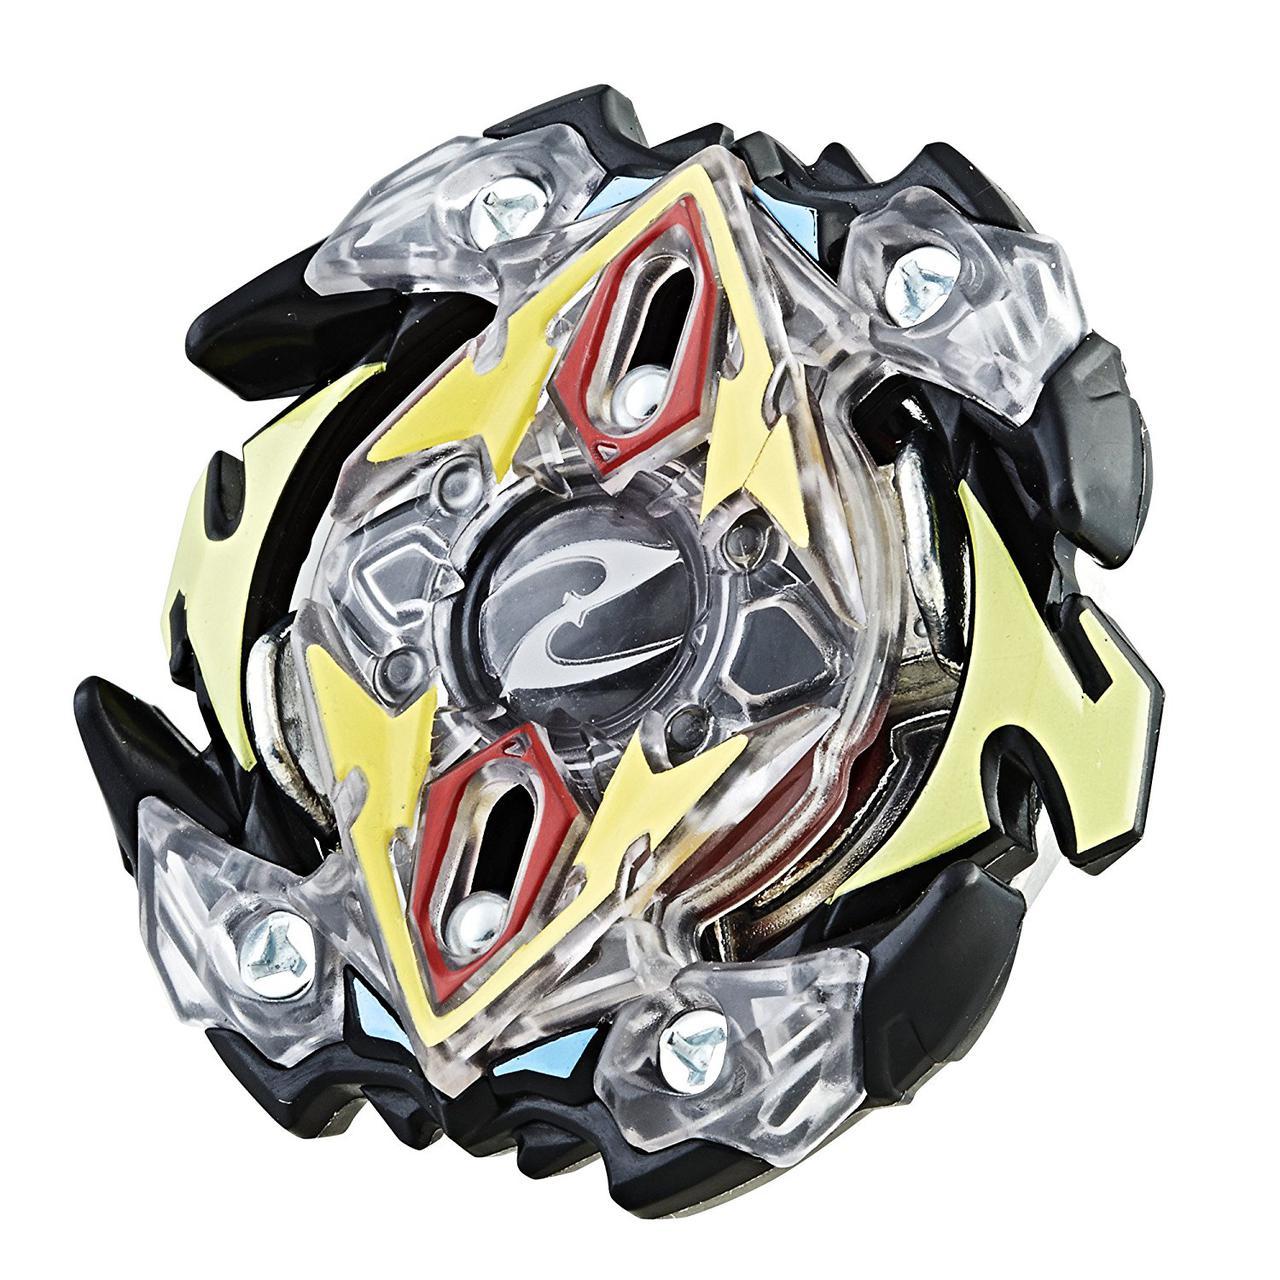 Бейблейд Зейтрон оригинал от HASBRO с пусковым устройством Beyblade Burst Zeutron Z2